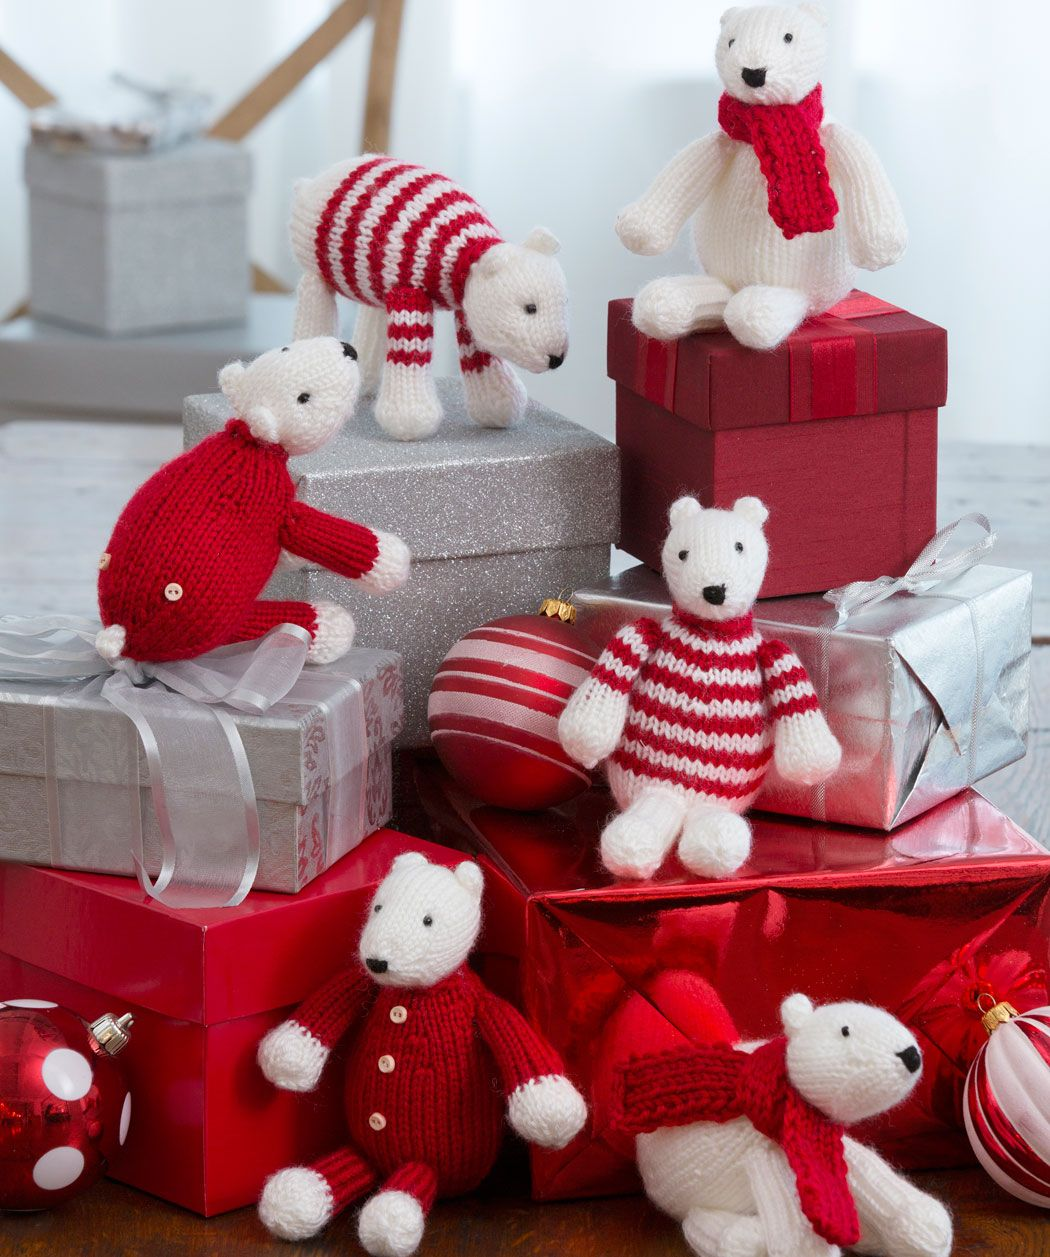 Make It Merry Pattern | Red Heart | Crochet | Pinterest ...